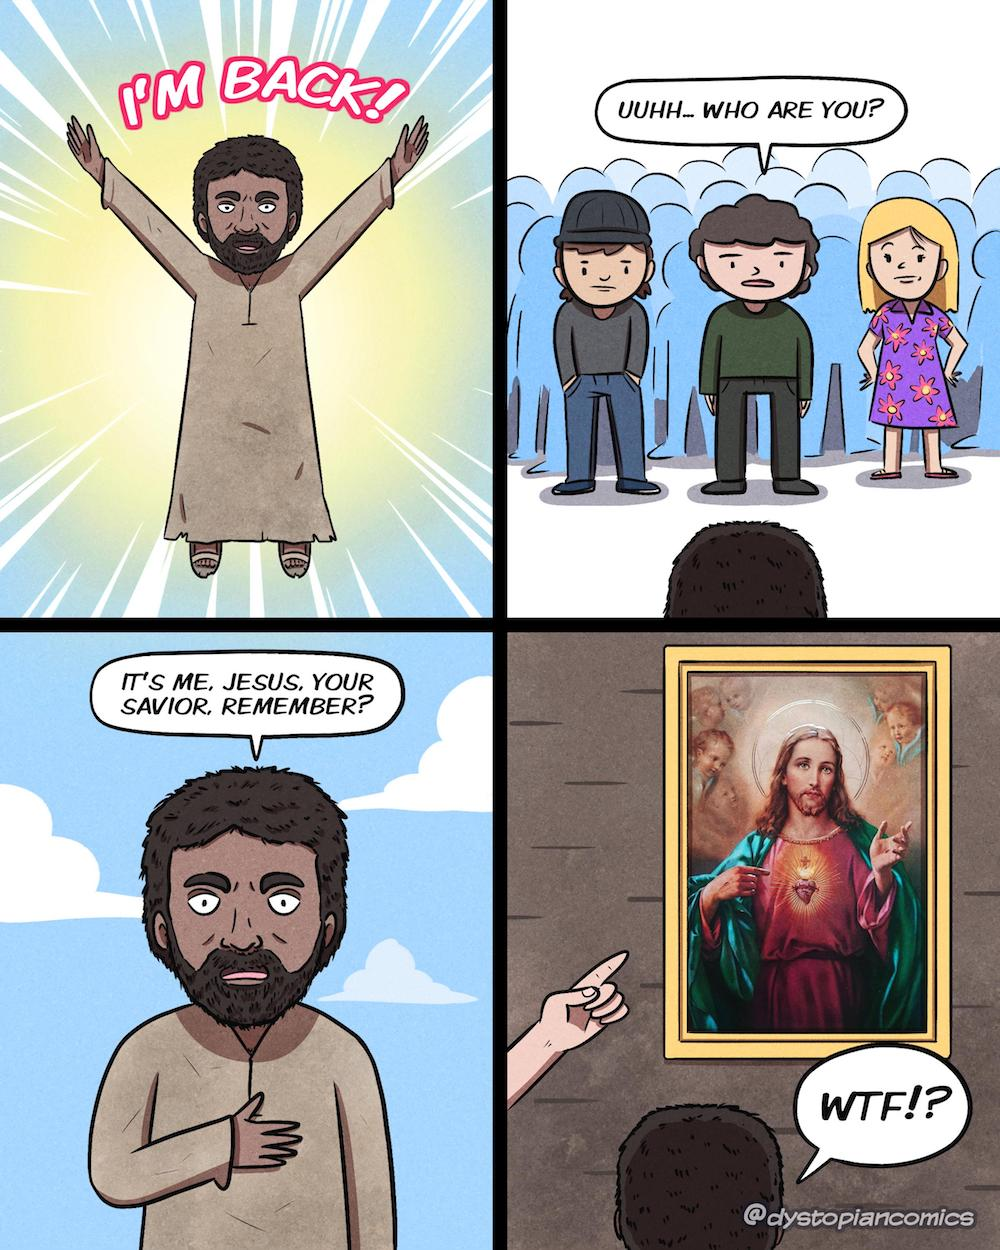 Jesus is back